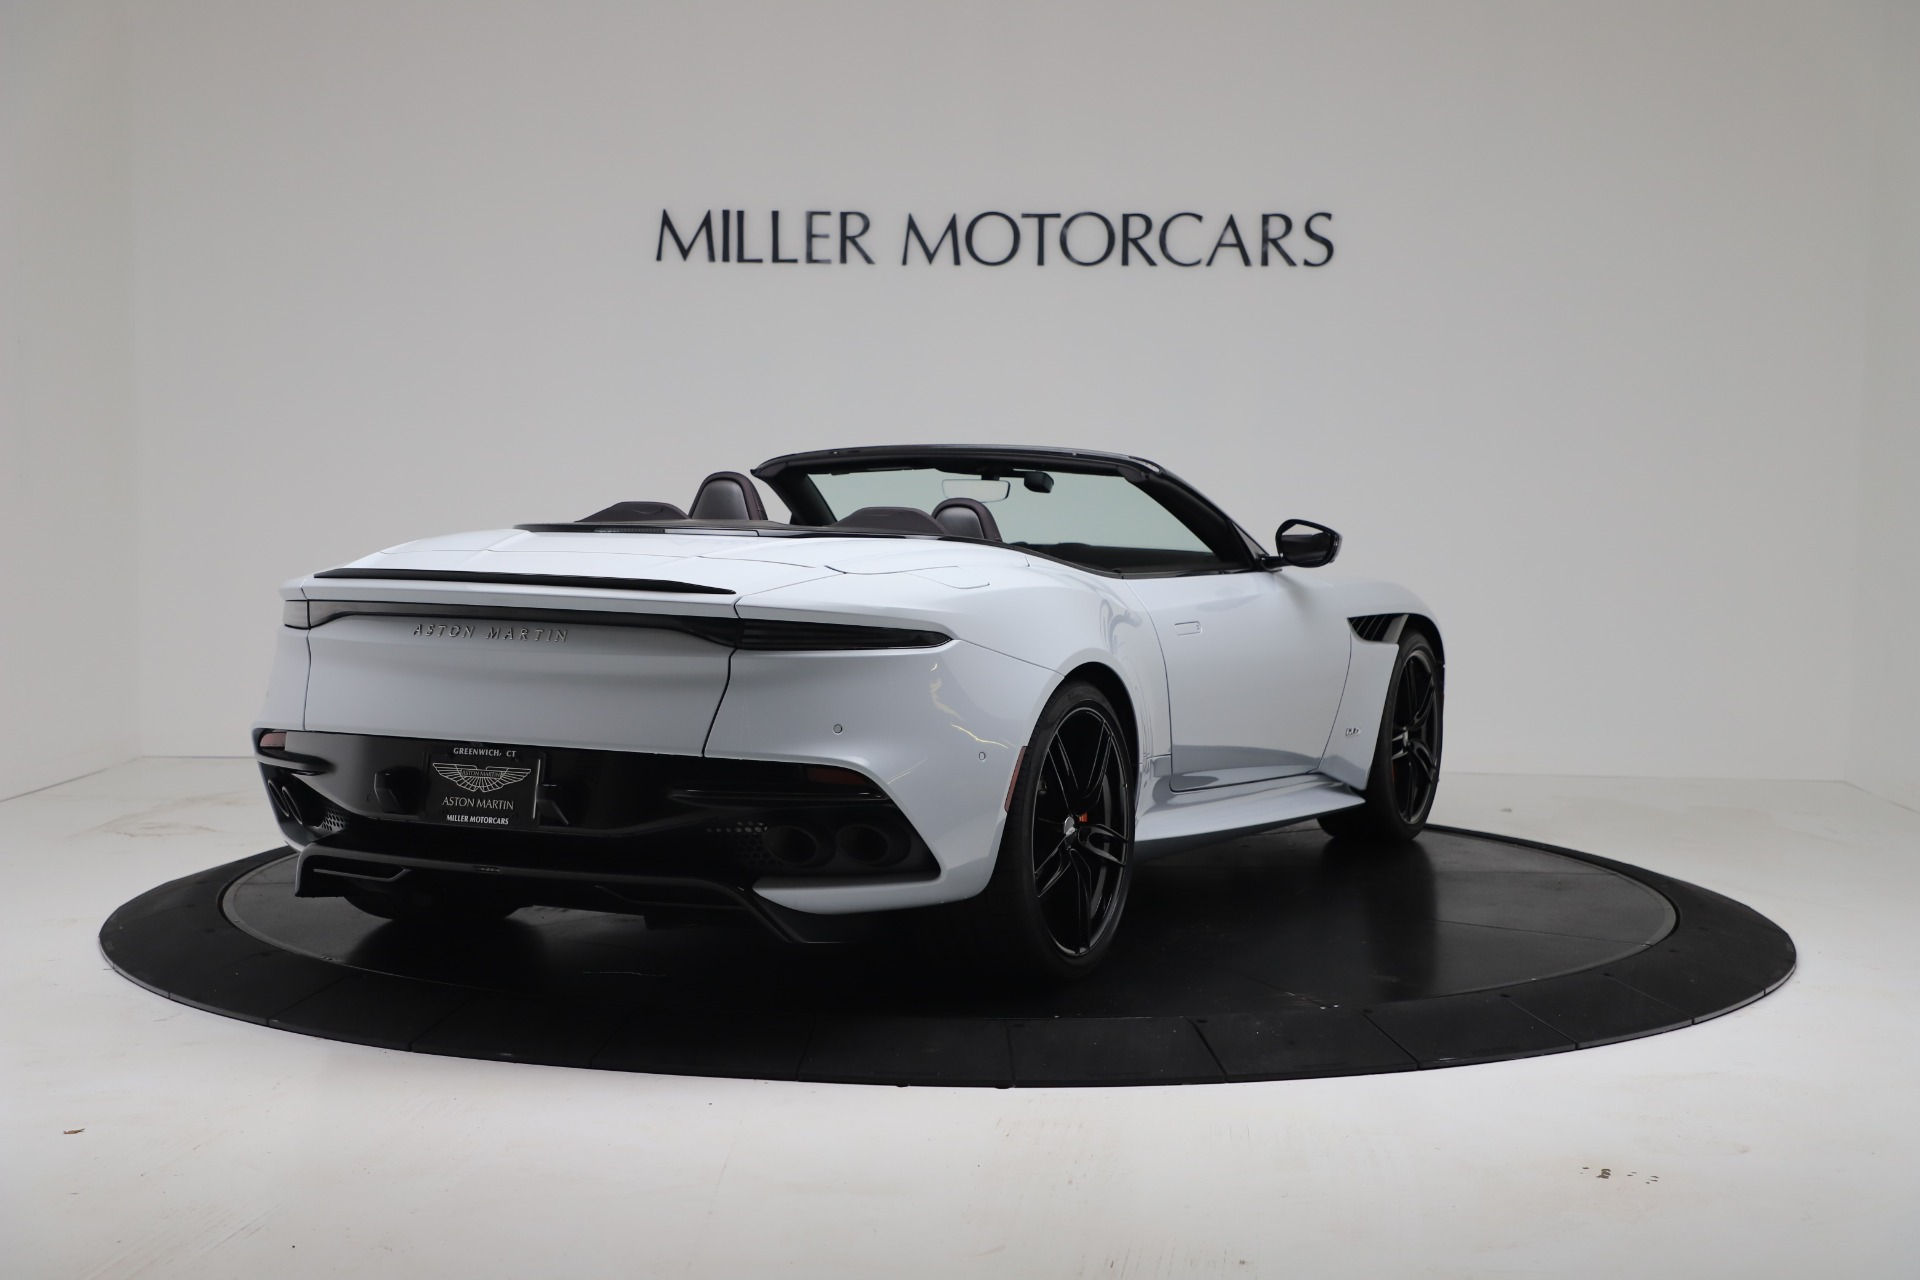 New 2020 Aston Martin DBS Superleggera For Sale In Greenwich, CT 3484_p6